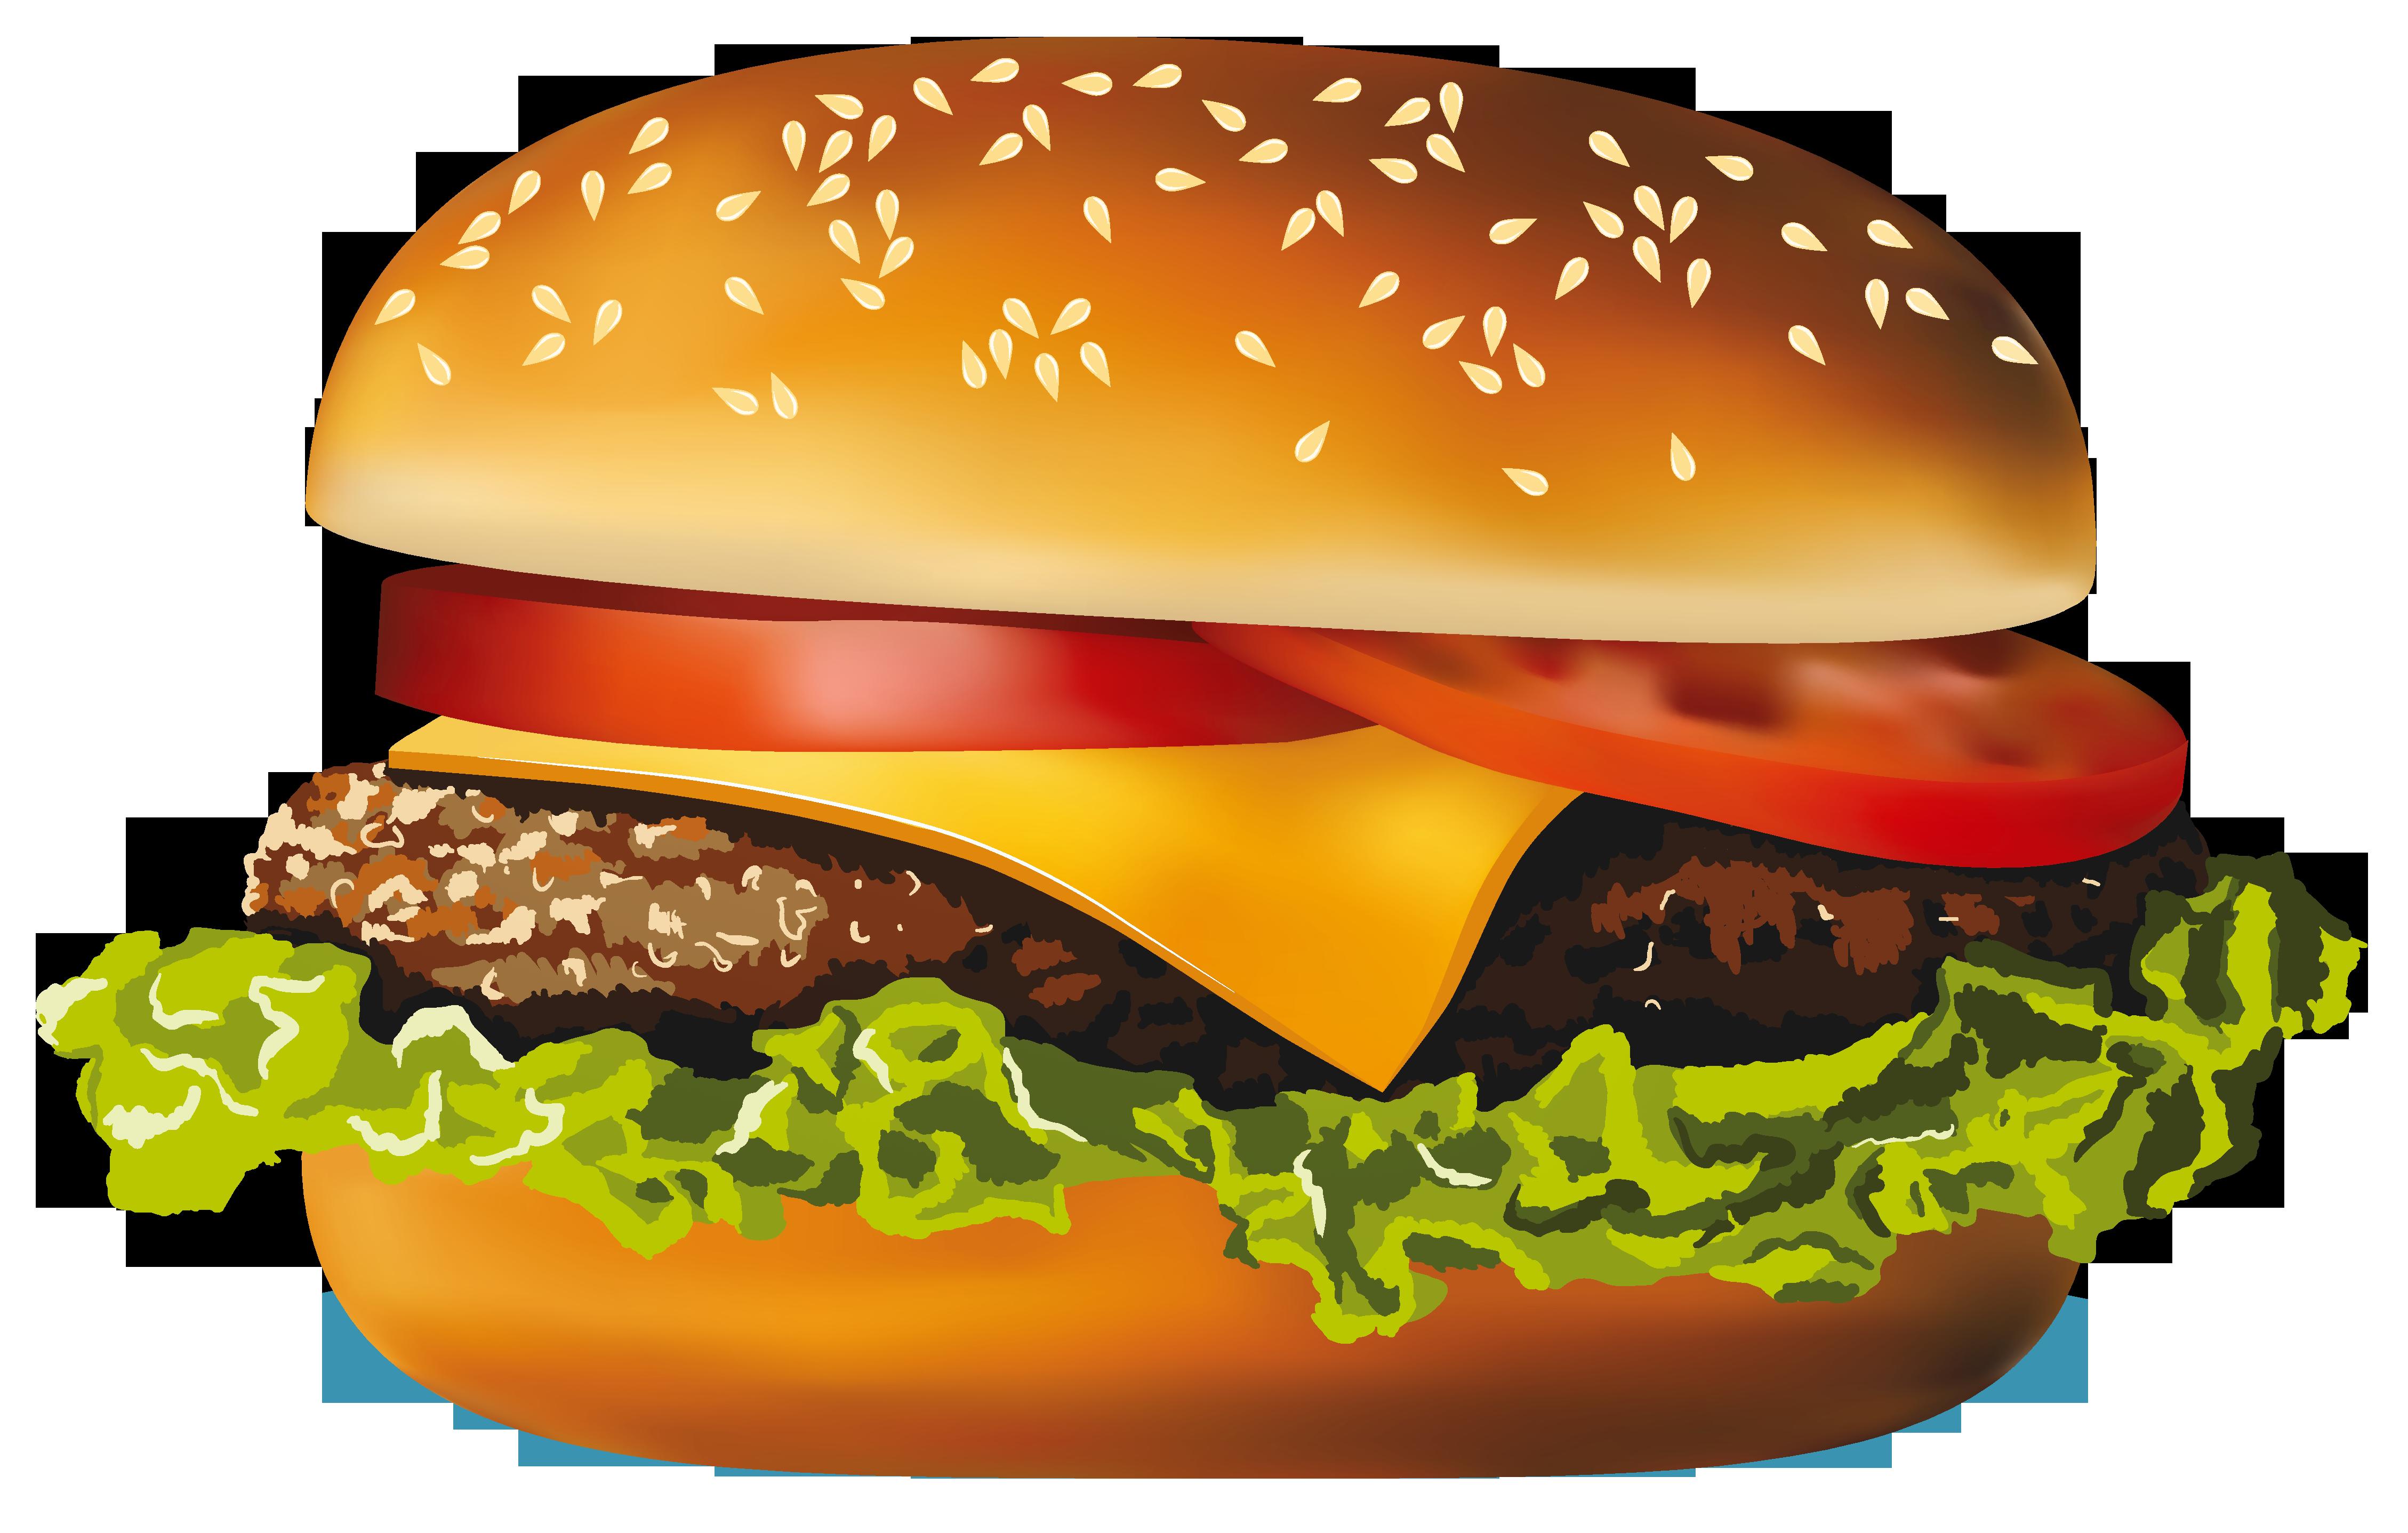 Hamburger clipart Hamburger Savoronmorehead Clipart Hamburger Clipart